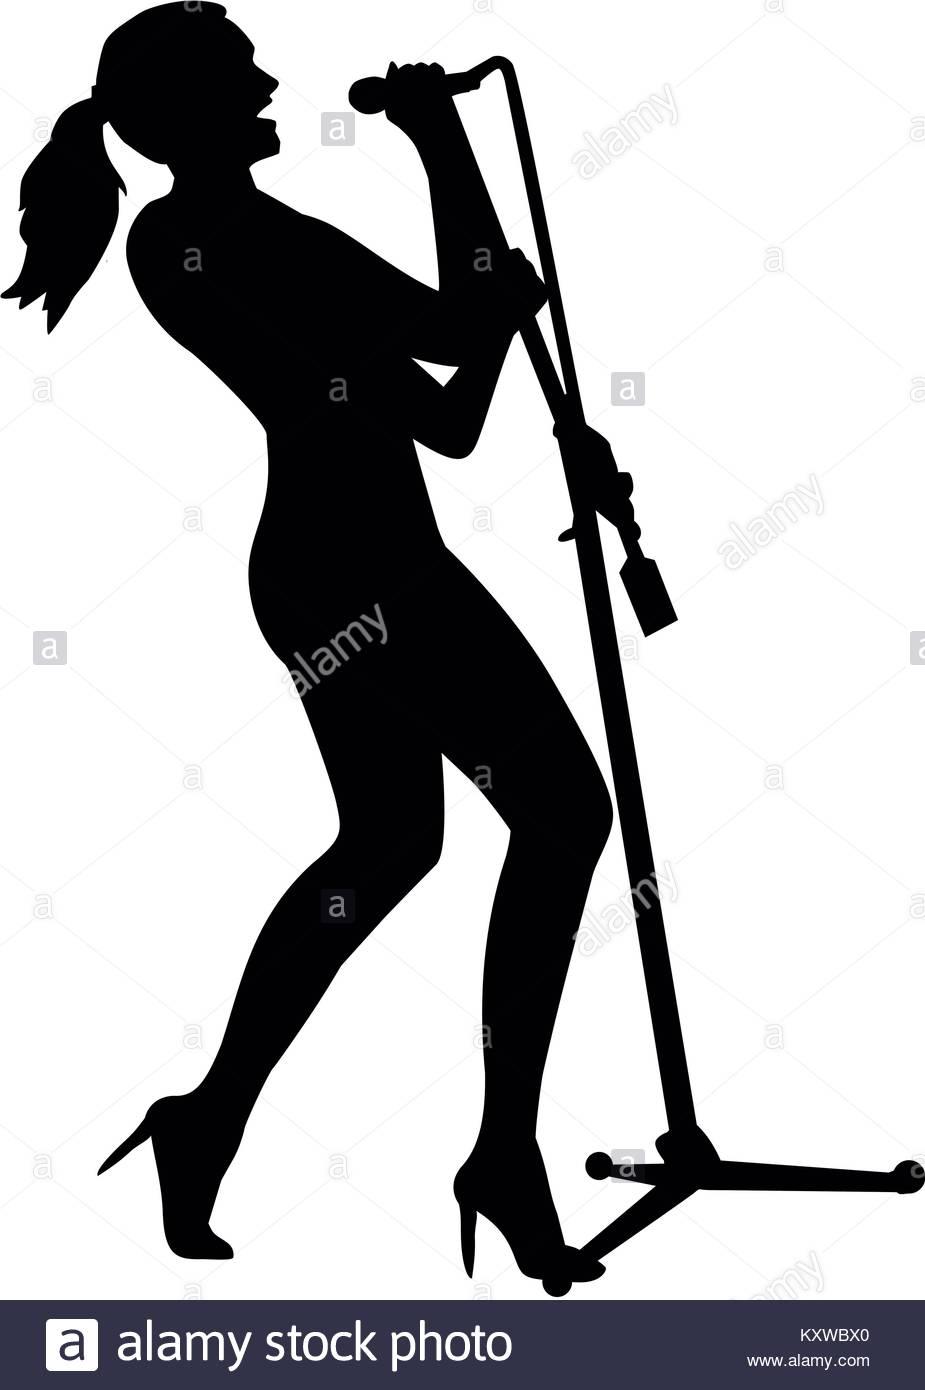 925x1390 Woman Singer Silhouette Stock Photos Amp Woman Singer Silhouette